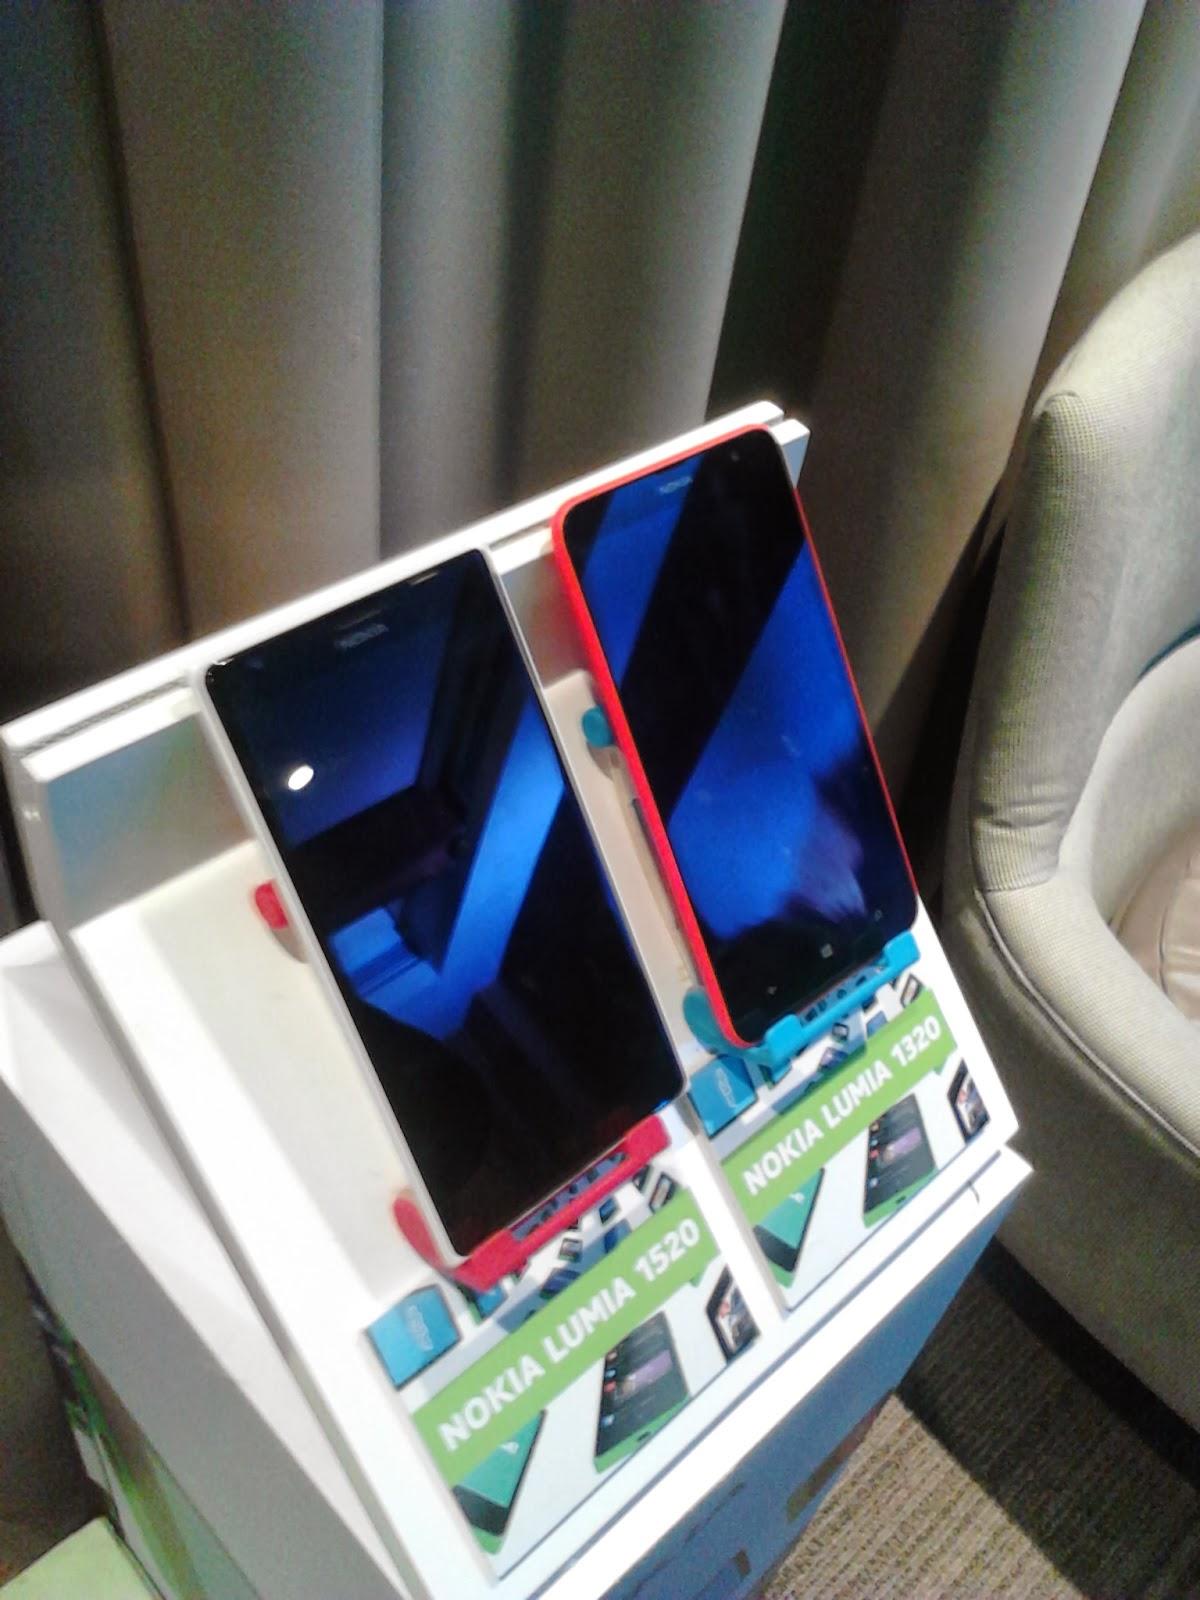 Nokia X Android Philippines Price Php 5,990, Specs ...